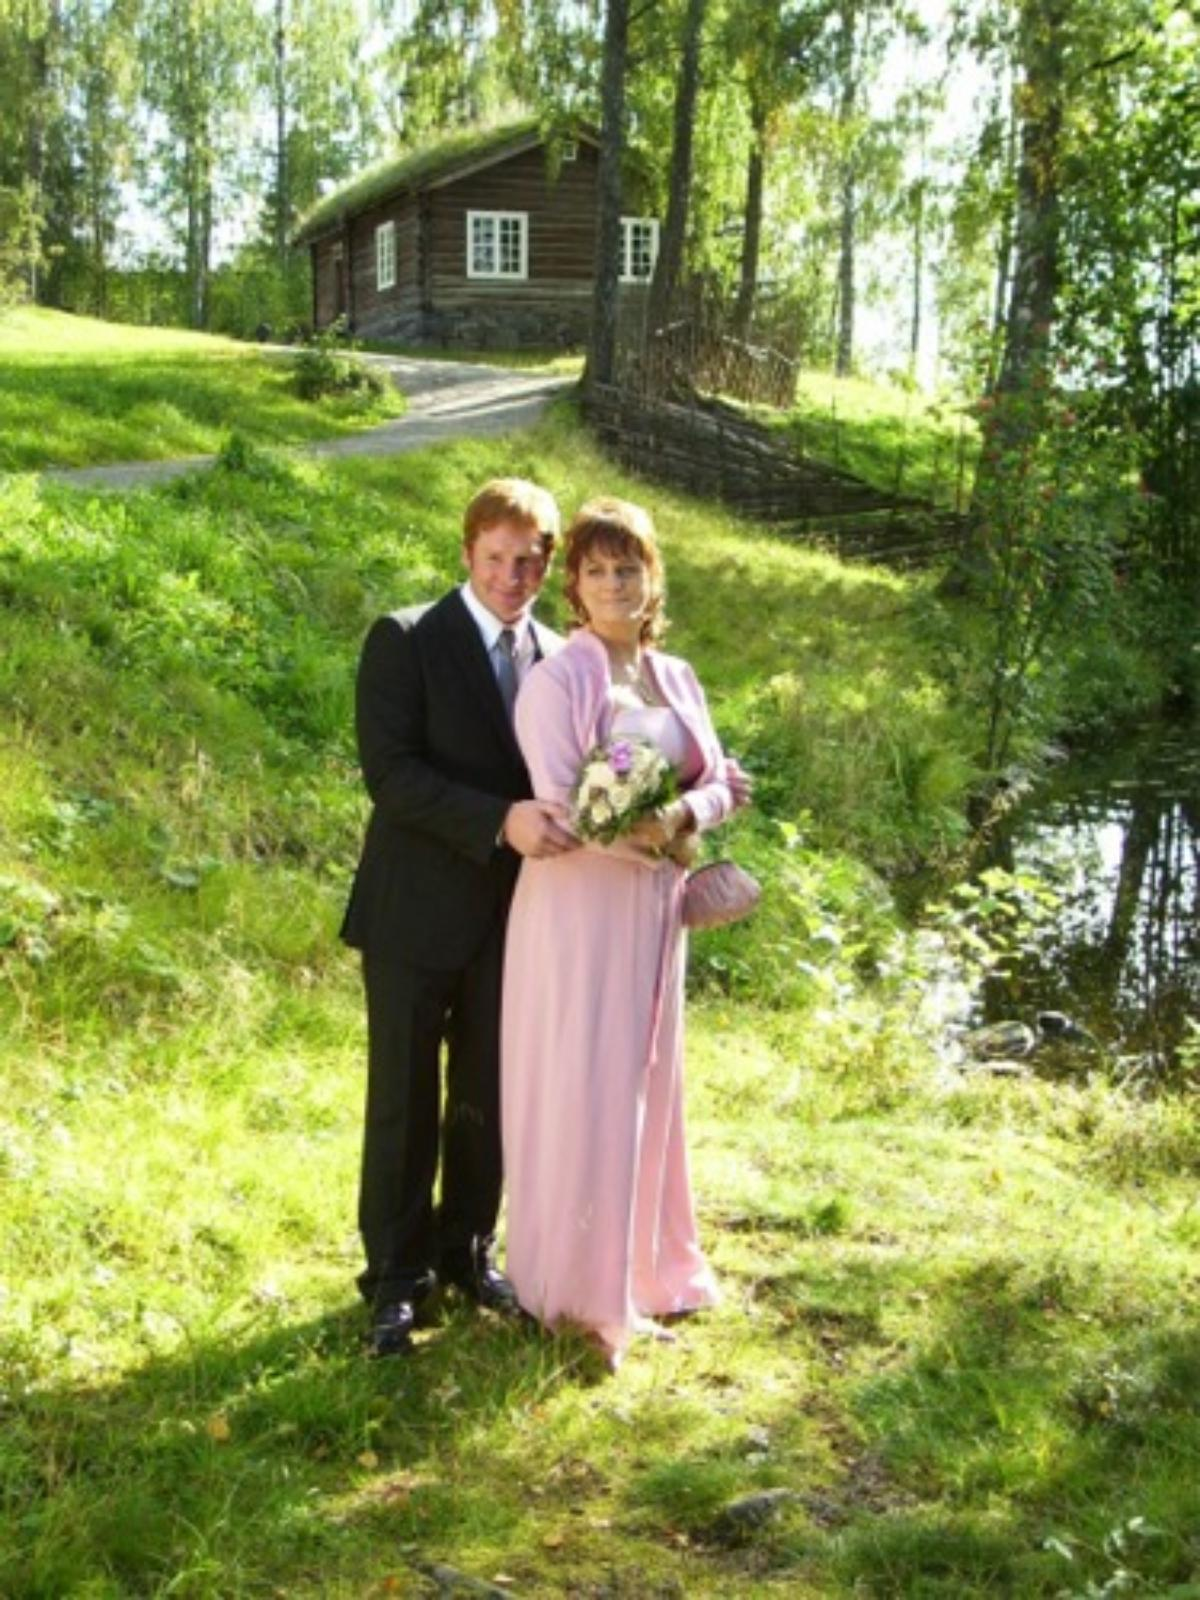 Ingrid and Terry, Lillehammer, 09. september 2006